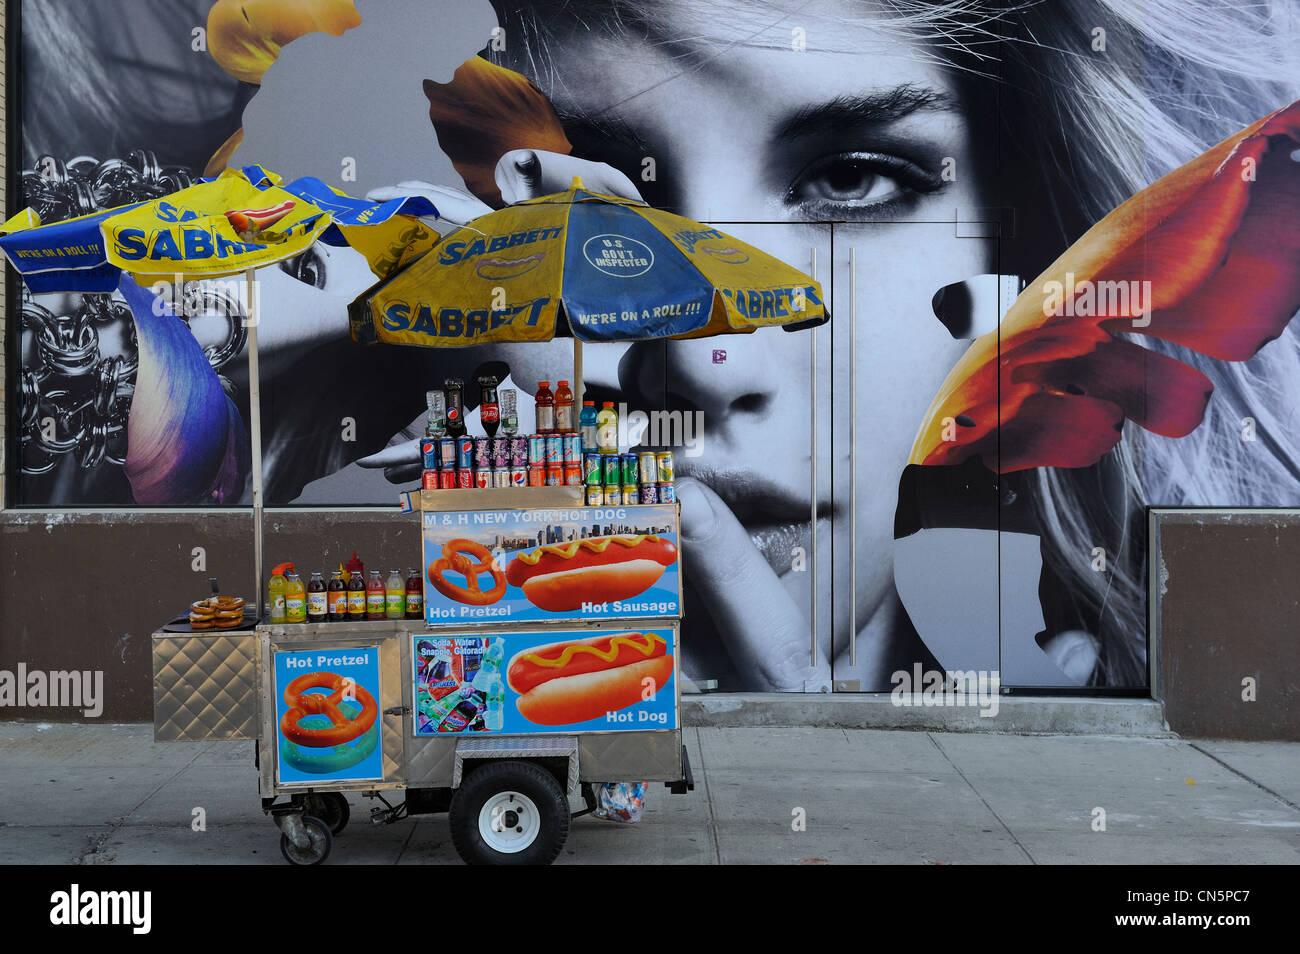 United States, New York City, Manhattan, Meatpacking District (Gansevoort Market), Street Food Vendor of hot dog - Stock Image